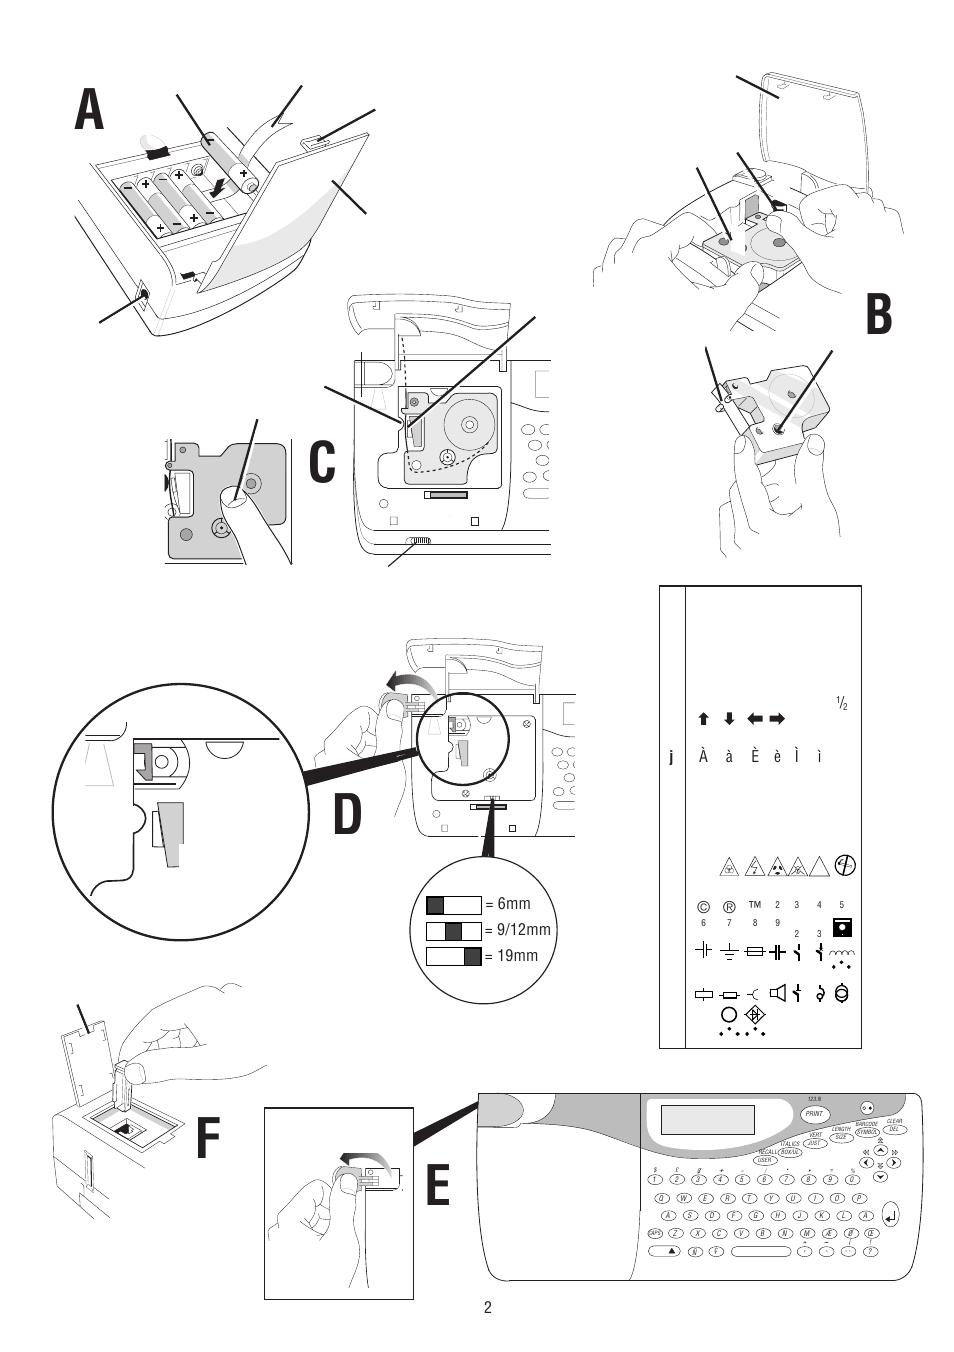 John Deere La110 Wiring Diagram John Deere La125 Wiring